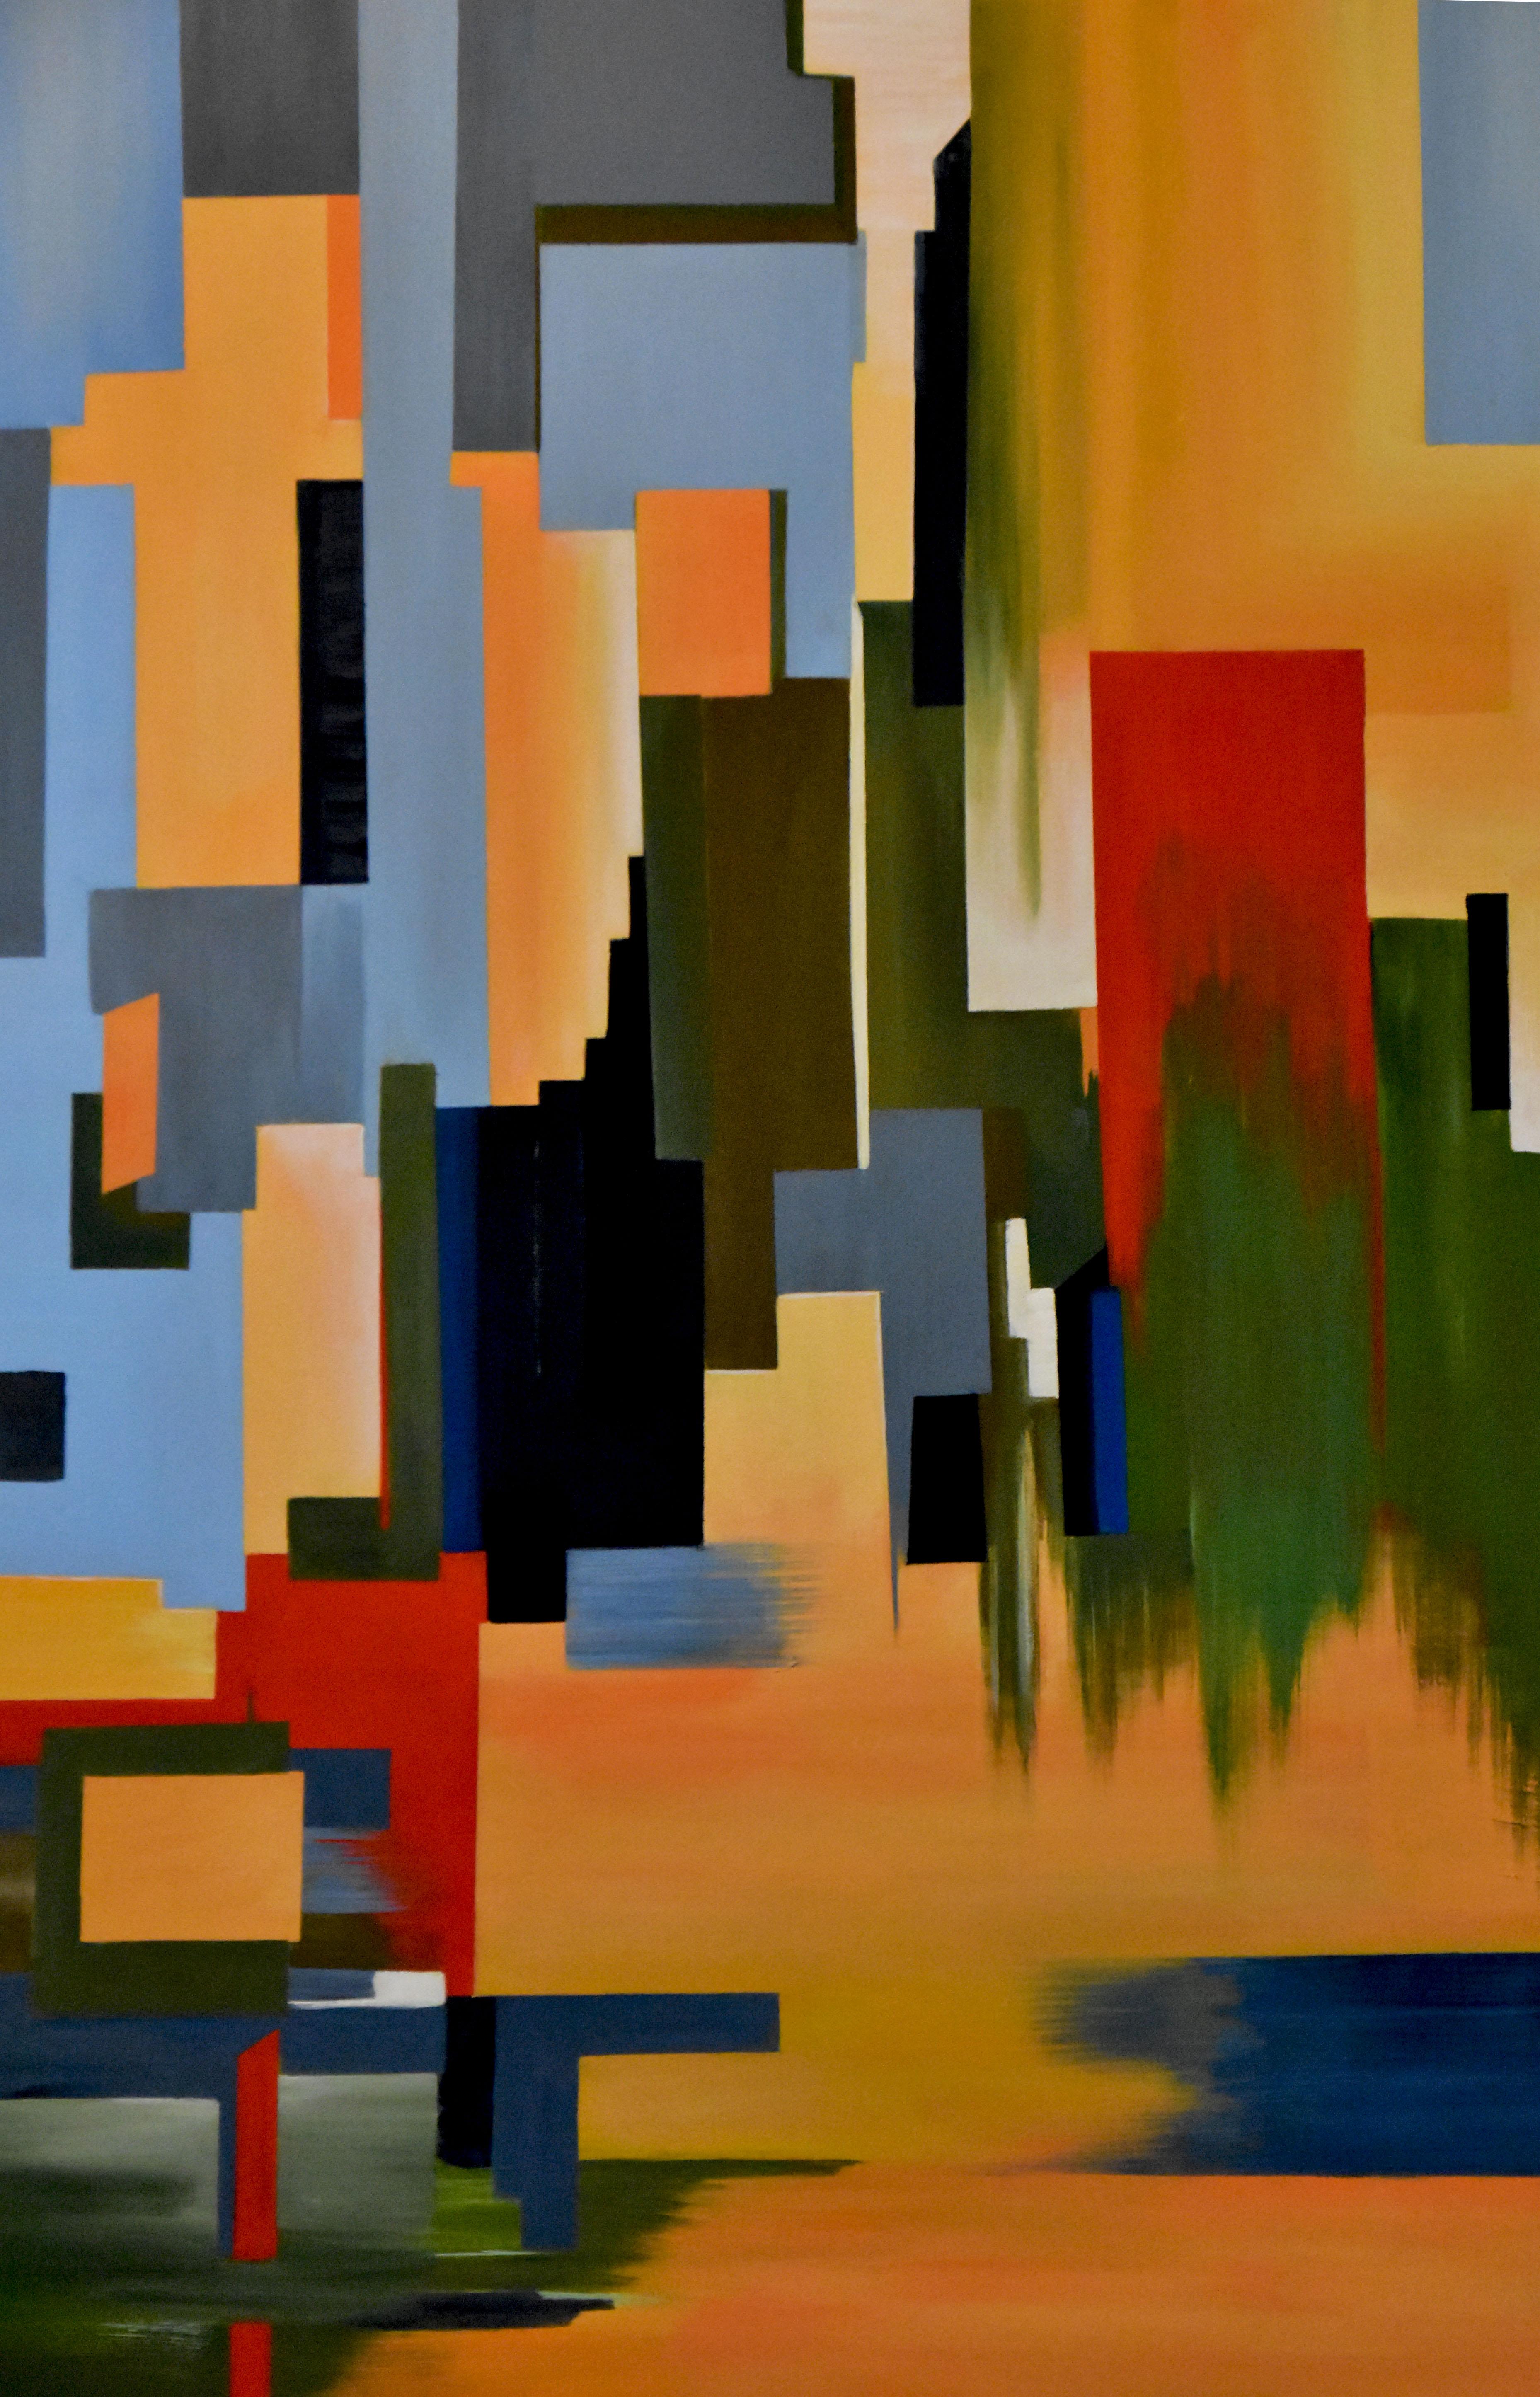 Kaleidoscope City. 2018. Acrylic on Canvas. 30x40 in